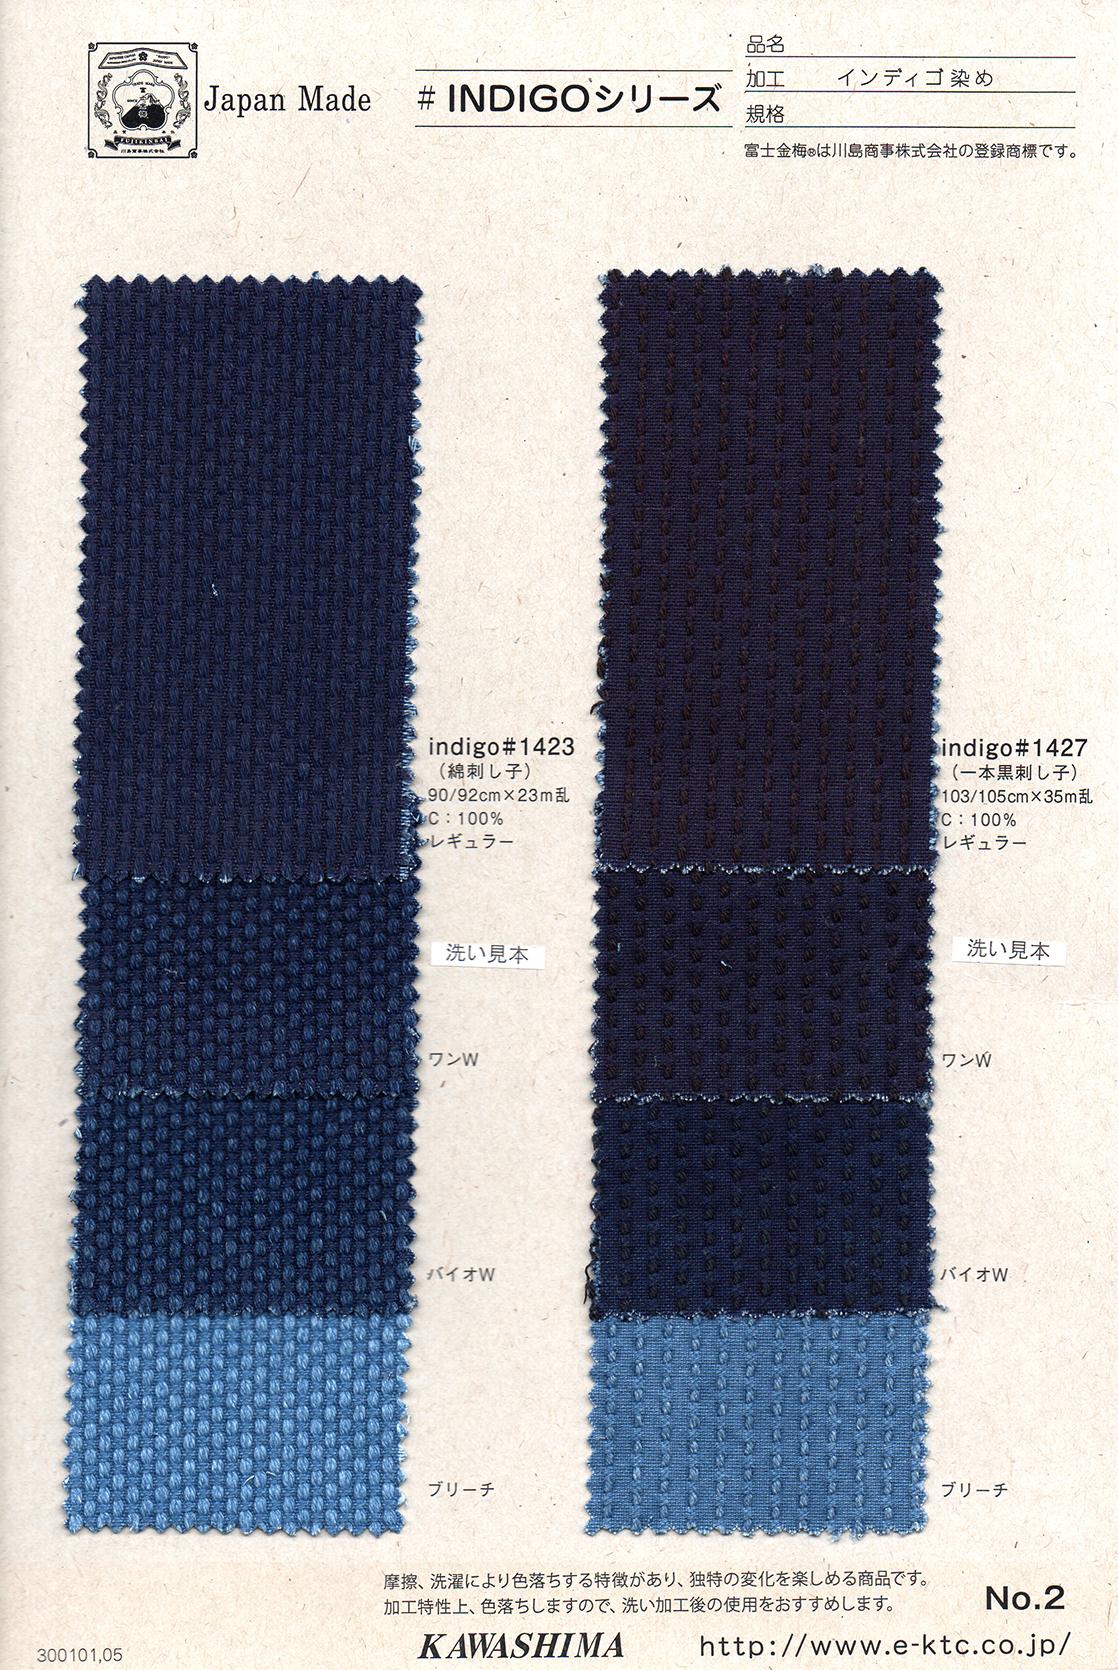 INDIGO(インディゴ)シリーズ【#79A/#11/#10/#8/#1423/#1427】